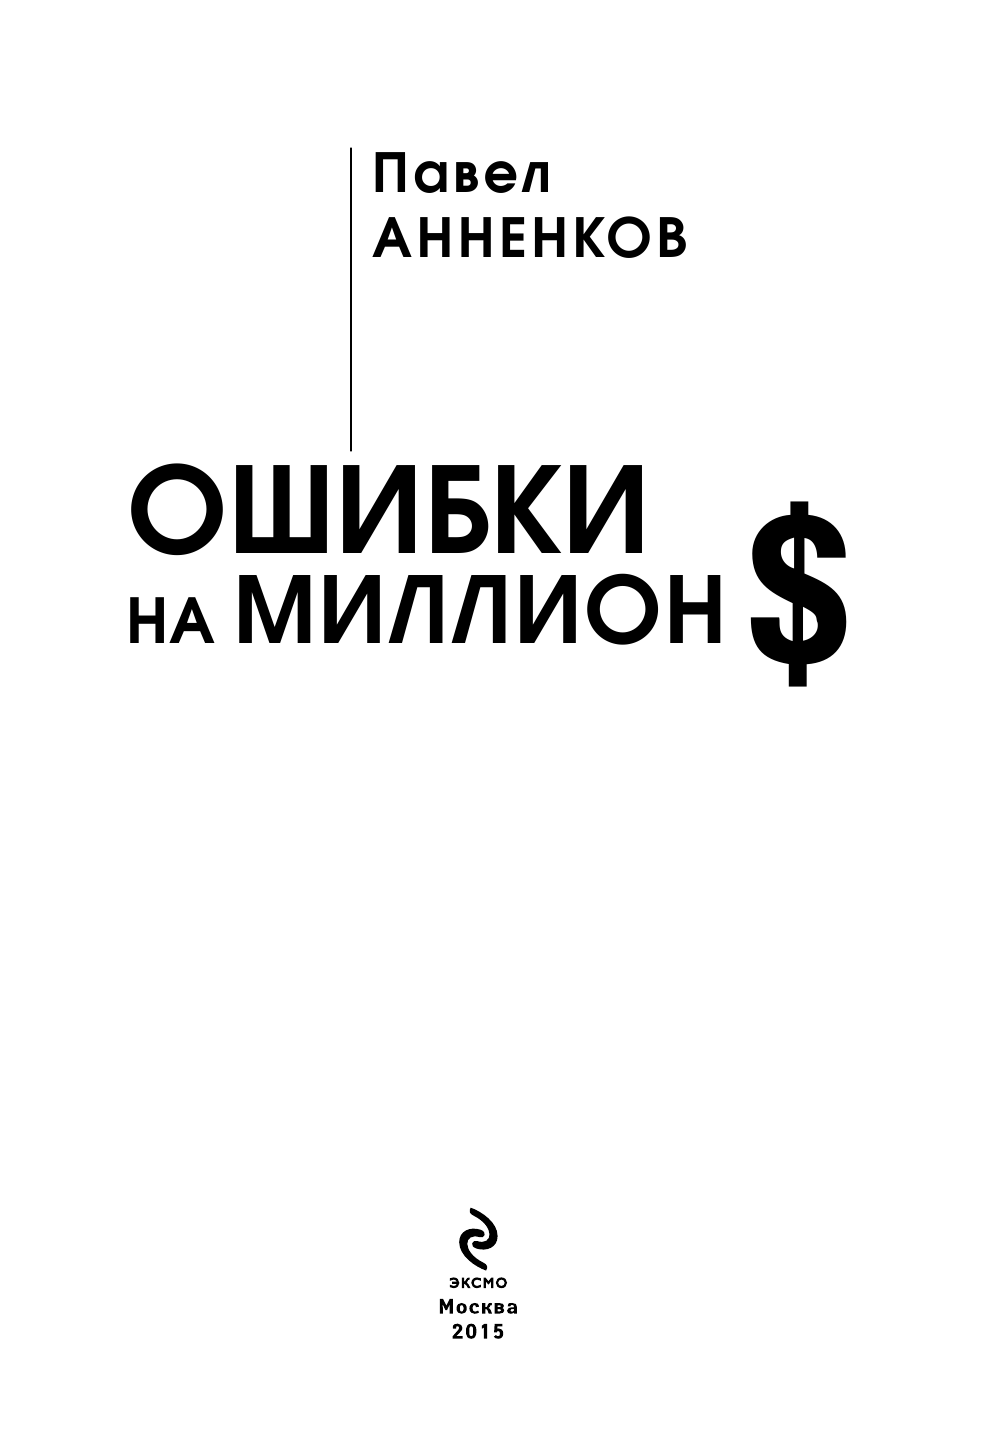 «Ошибки на миллион долларов»